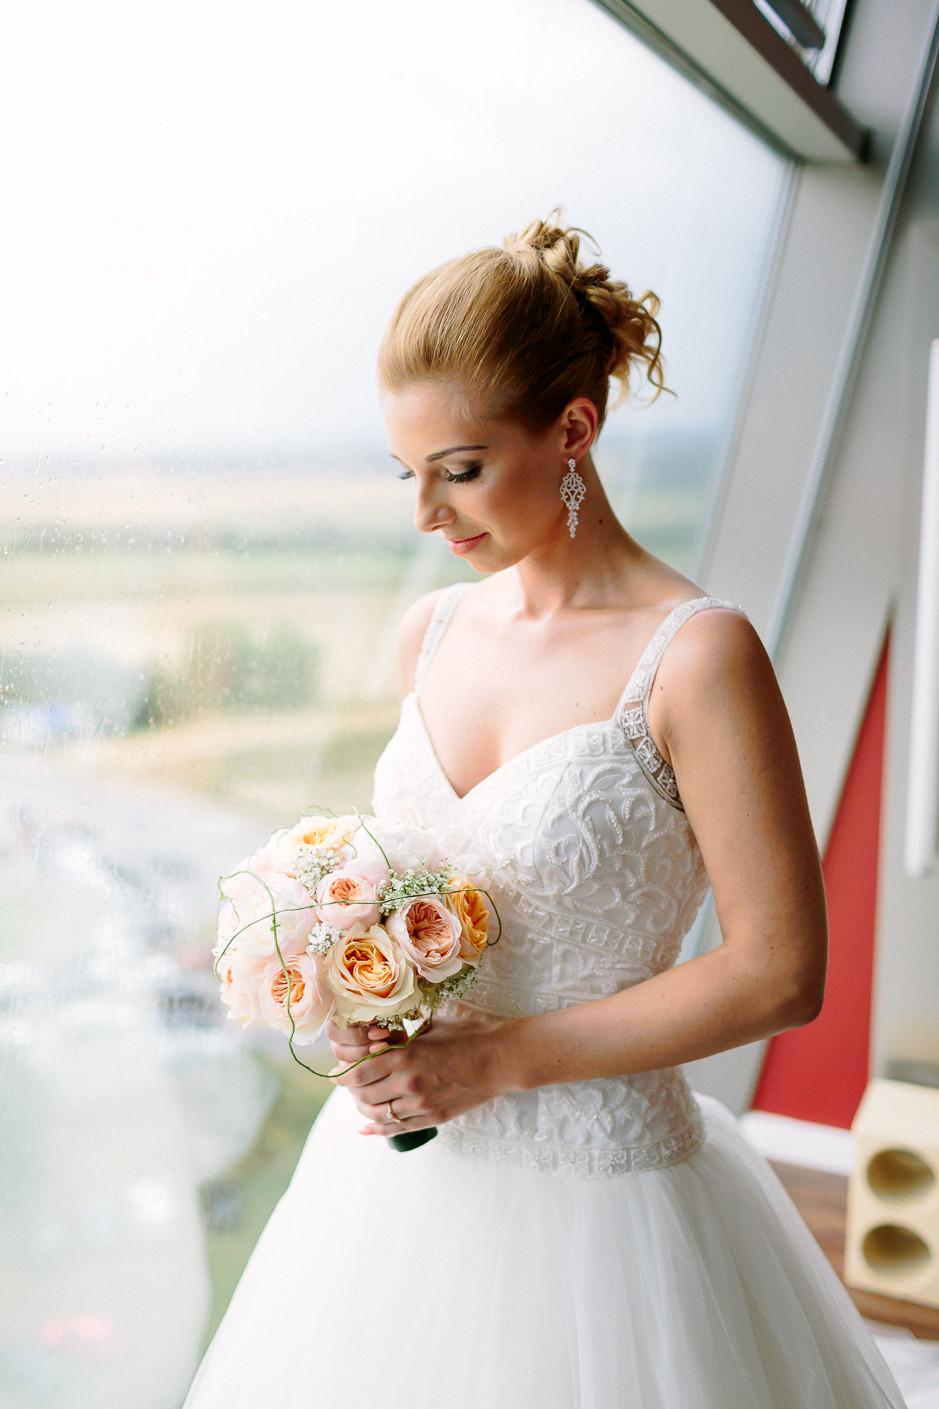 Daniela+Manuel - DM-Hochzeit-Weingut-Hillinger-026.jpg